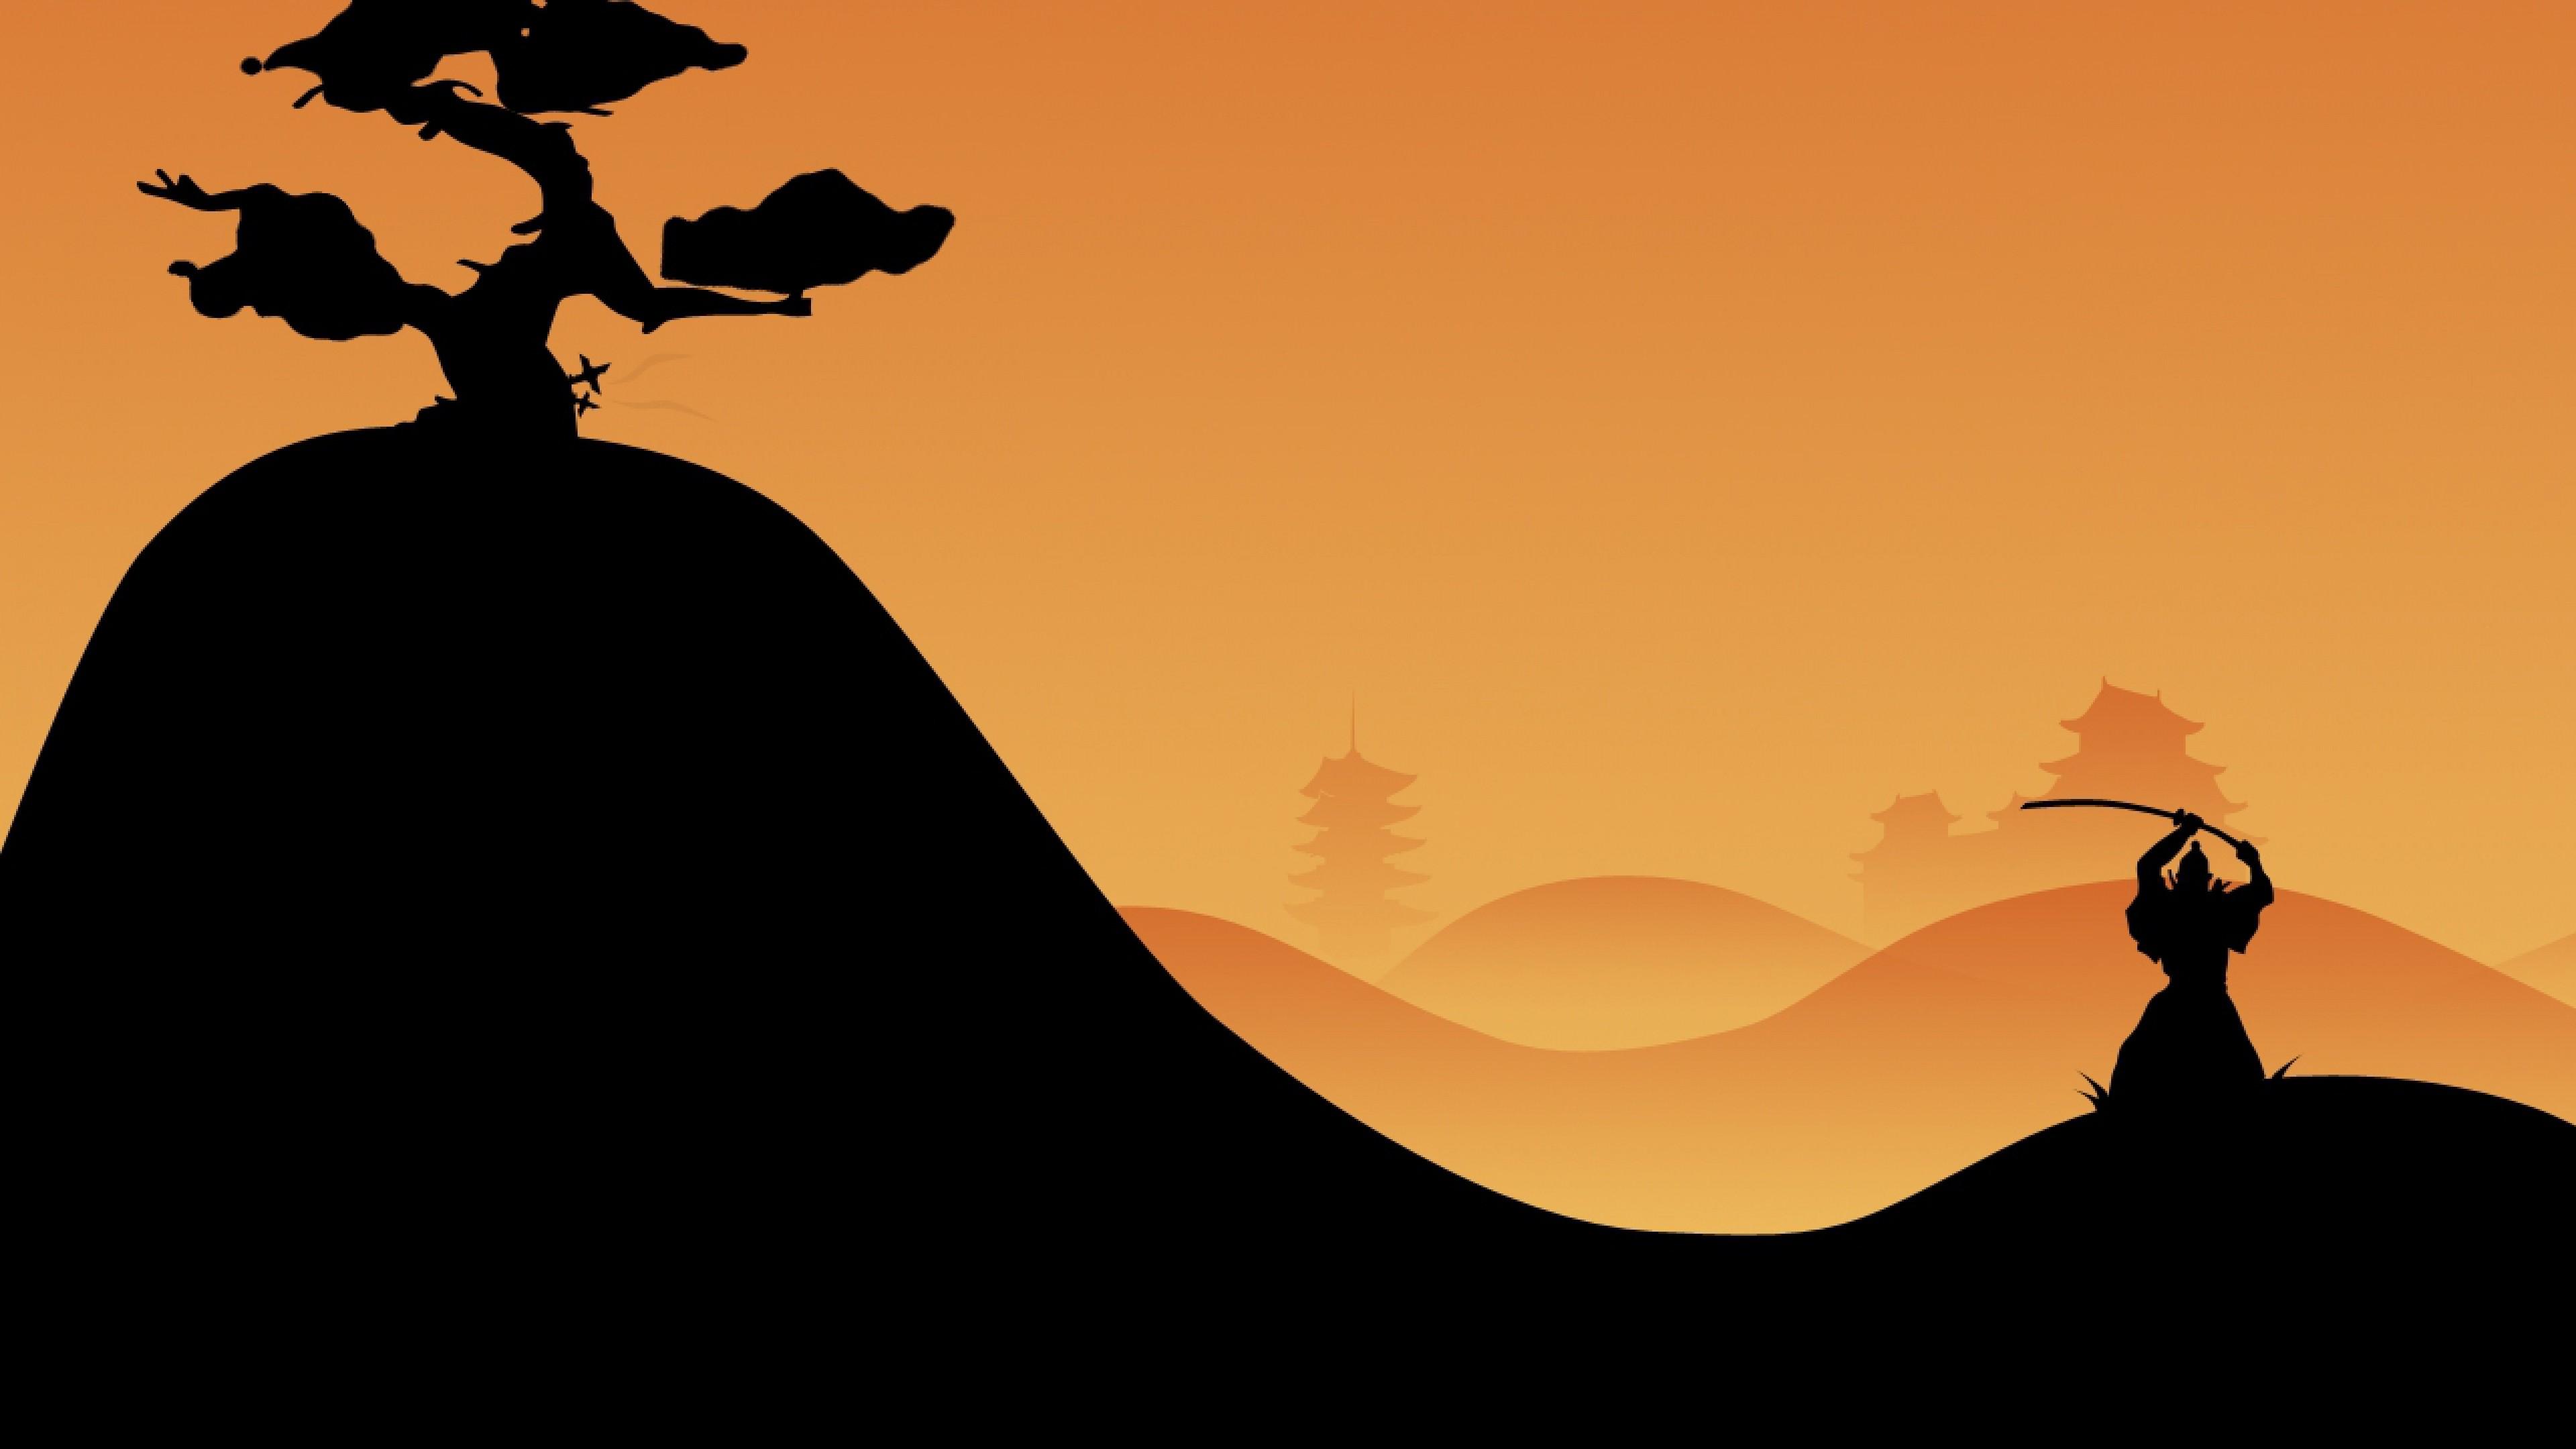 Preview rurouni kenshin